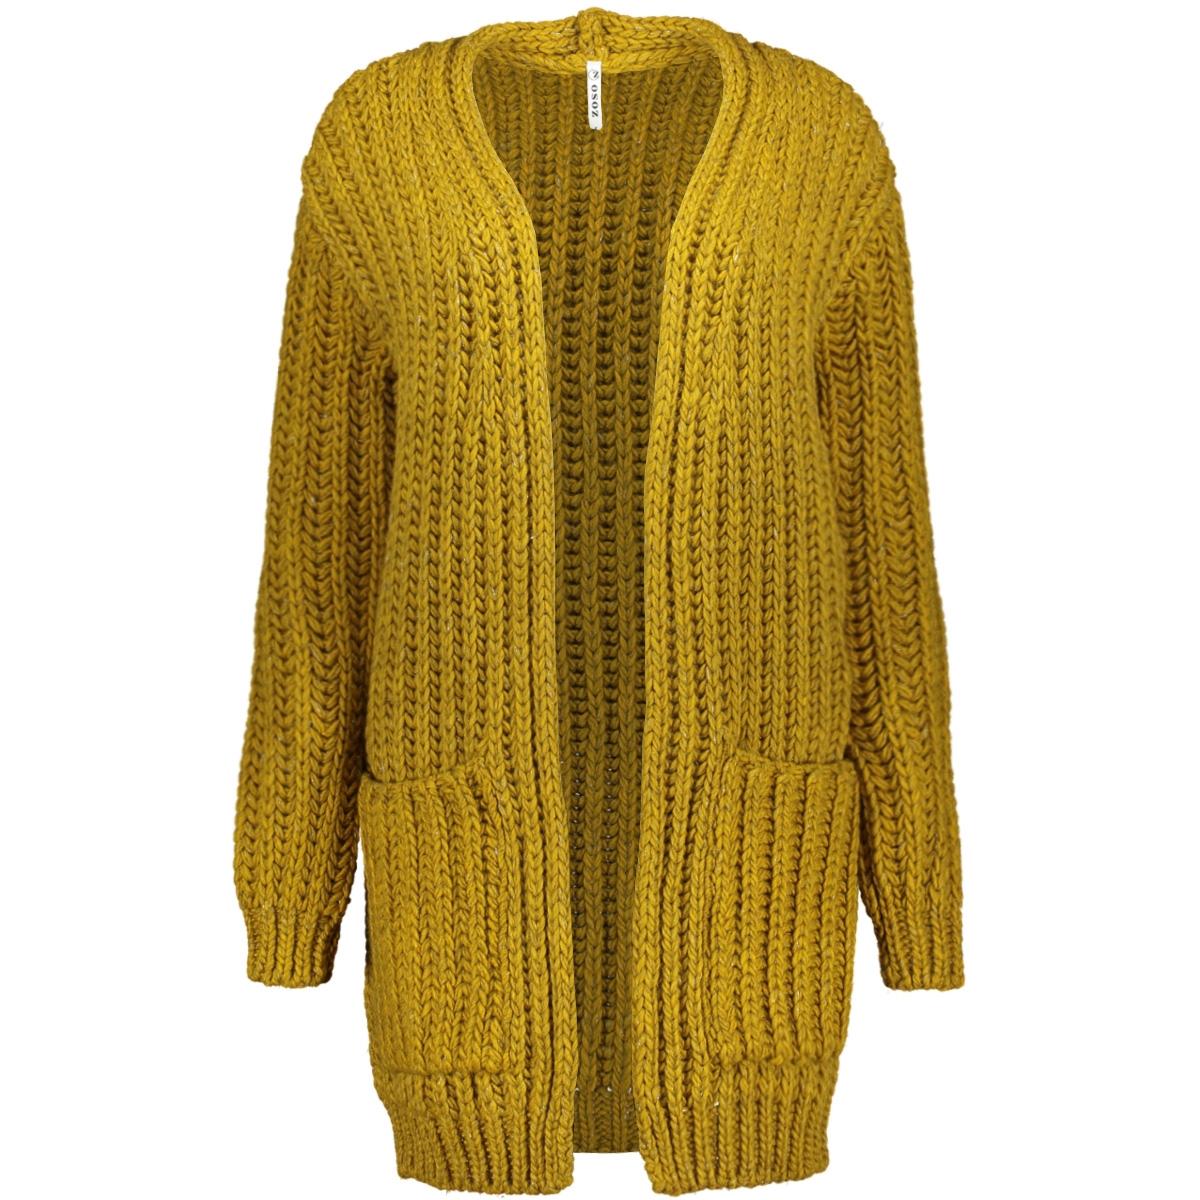 195 dyan cardigan melange yams zoso vest gold yellow